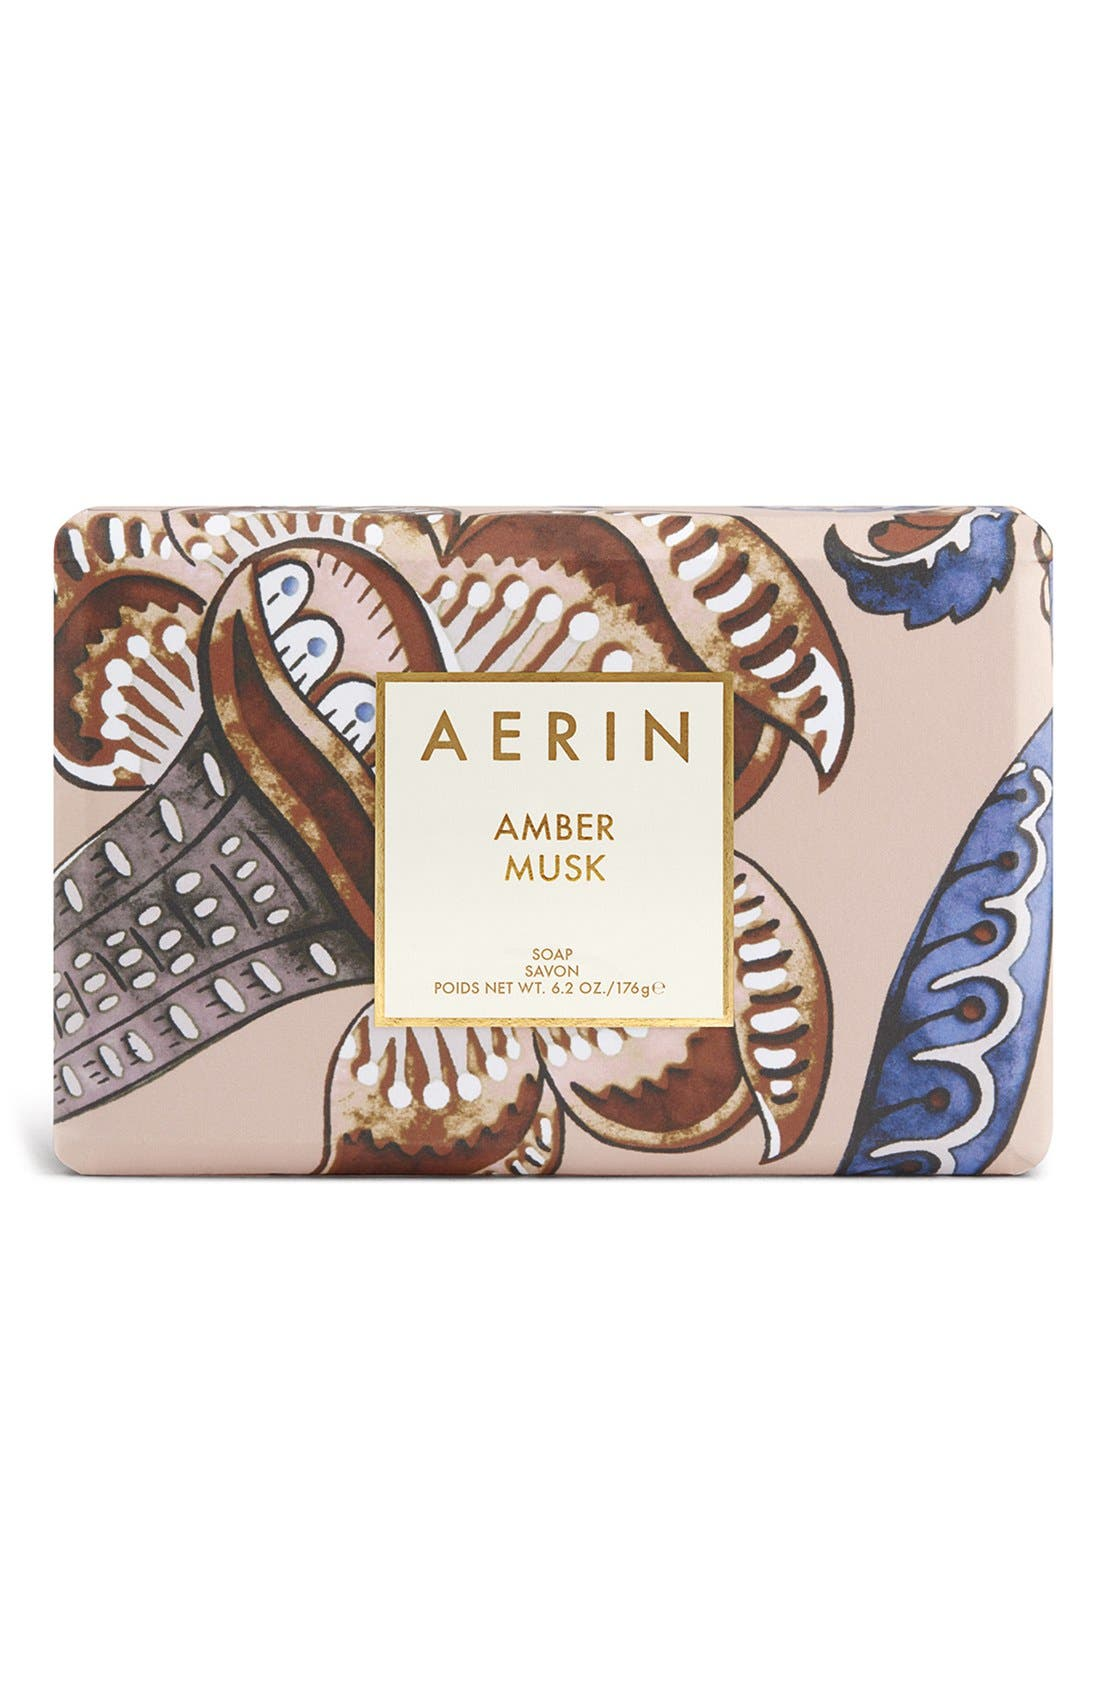 AERIN Beauty Amber Musk Soap